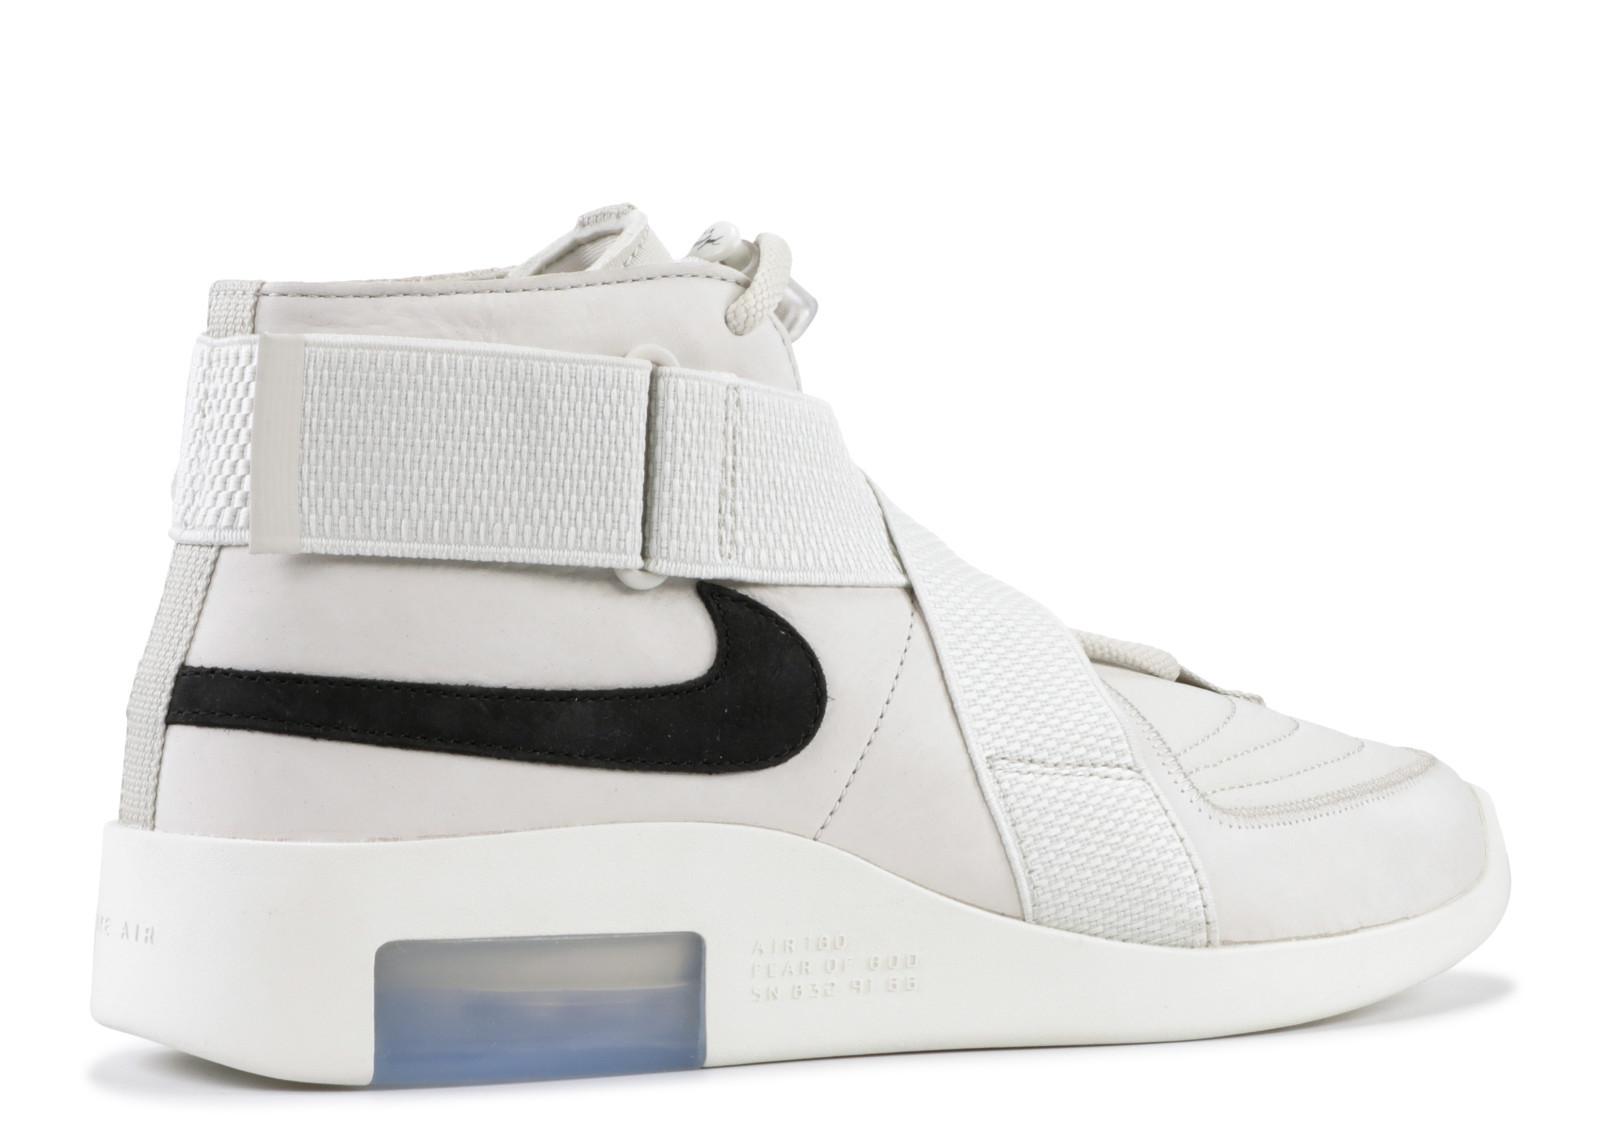 Nike Air Fear Of God 1 Light Bone Level Up